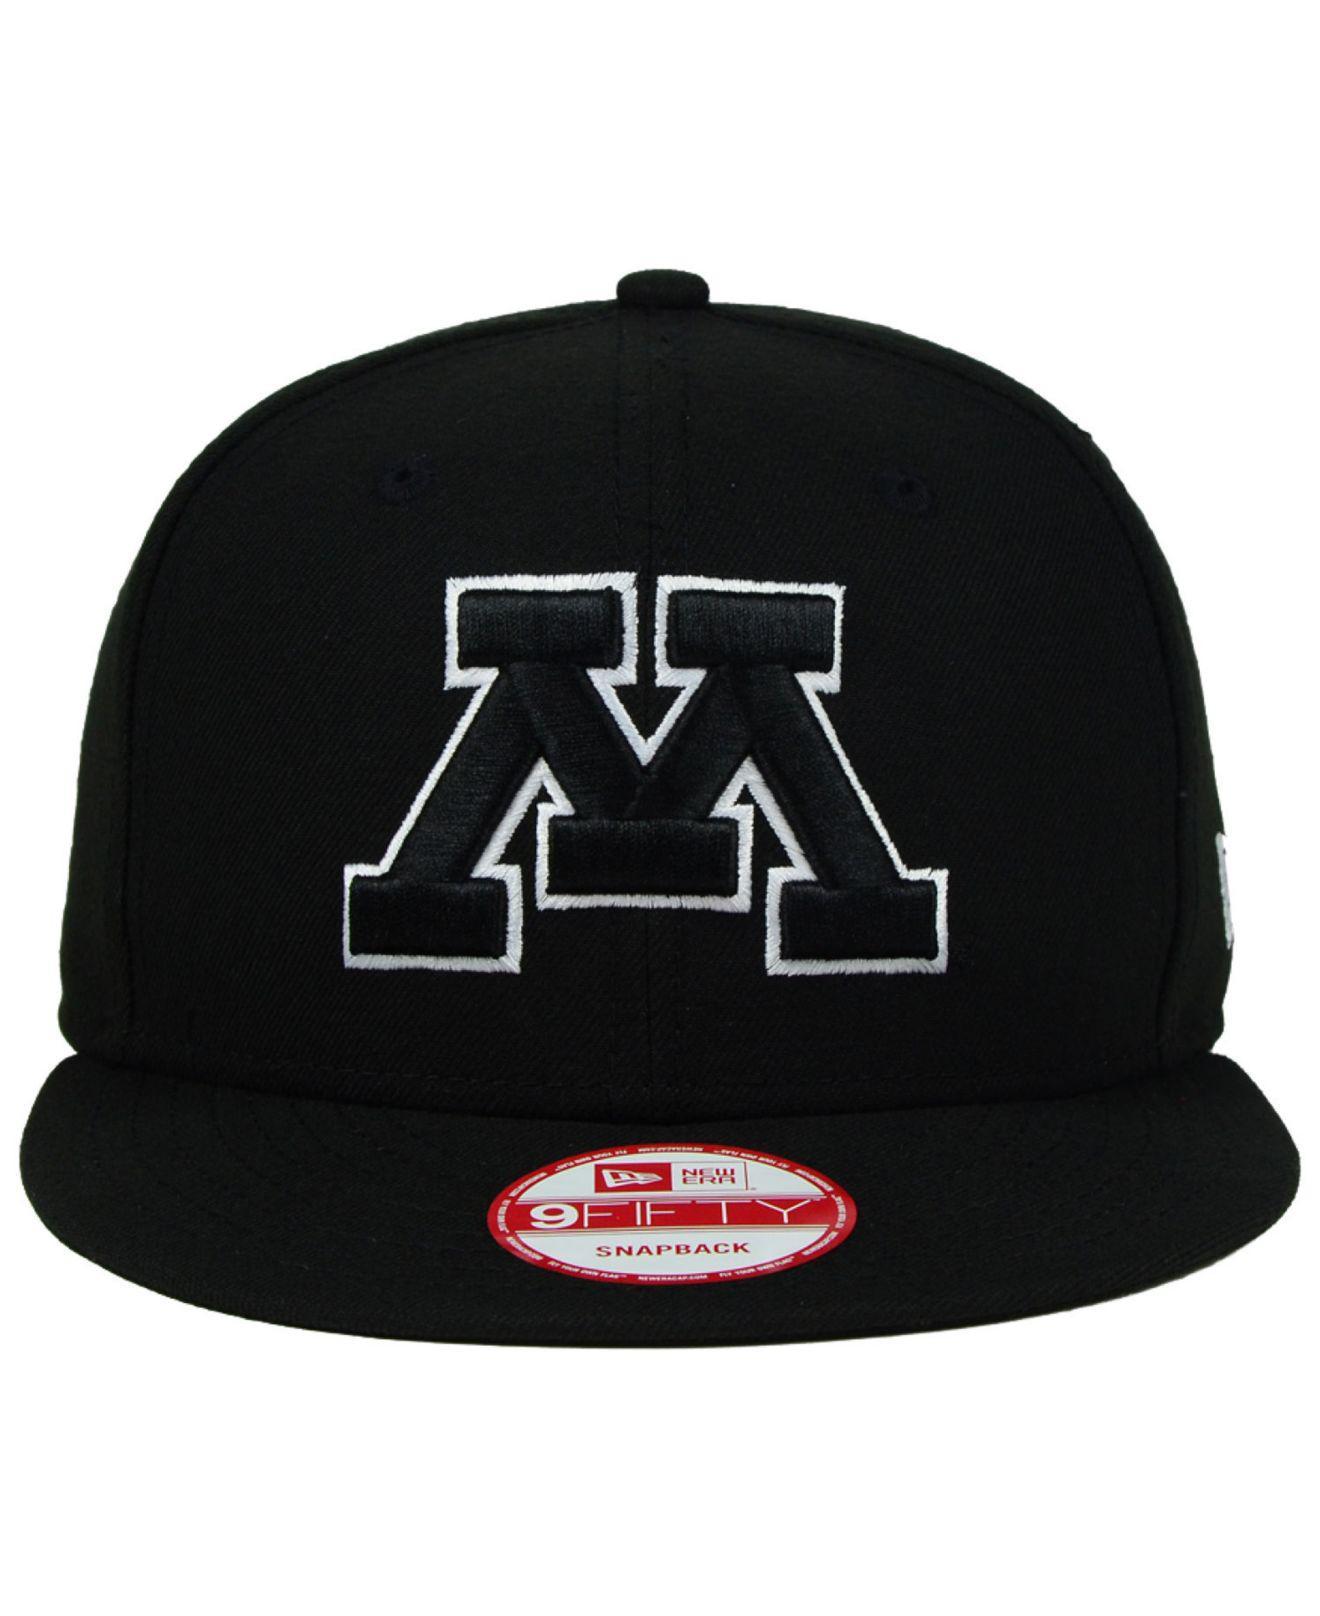 sale retailer 2b671 b97b5 ... purchase lyst ktz minnesota golden gophers black white 9fifty snapback  cap in black for men aaaca ...